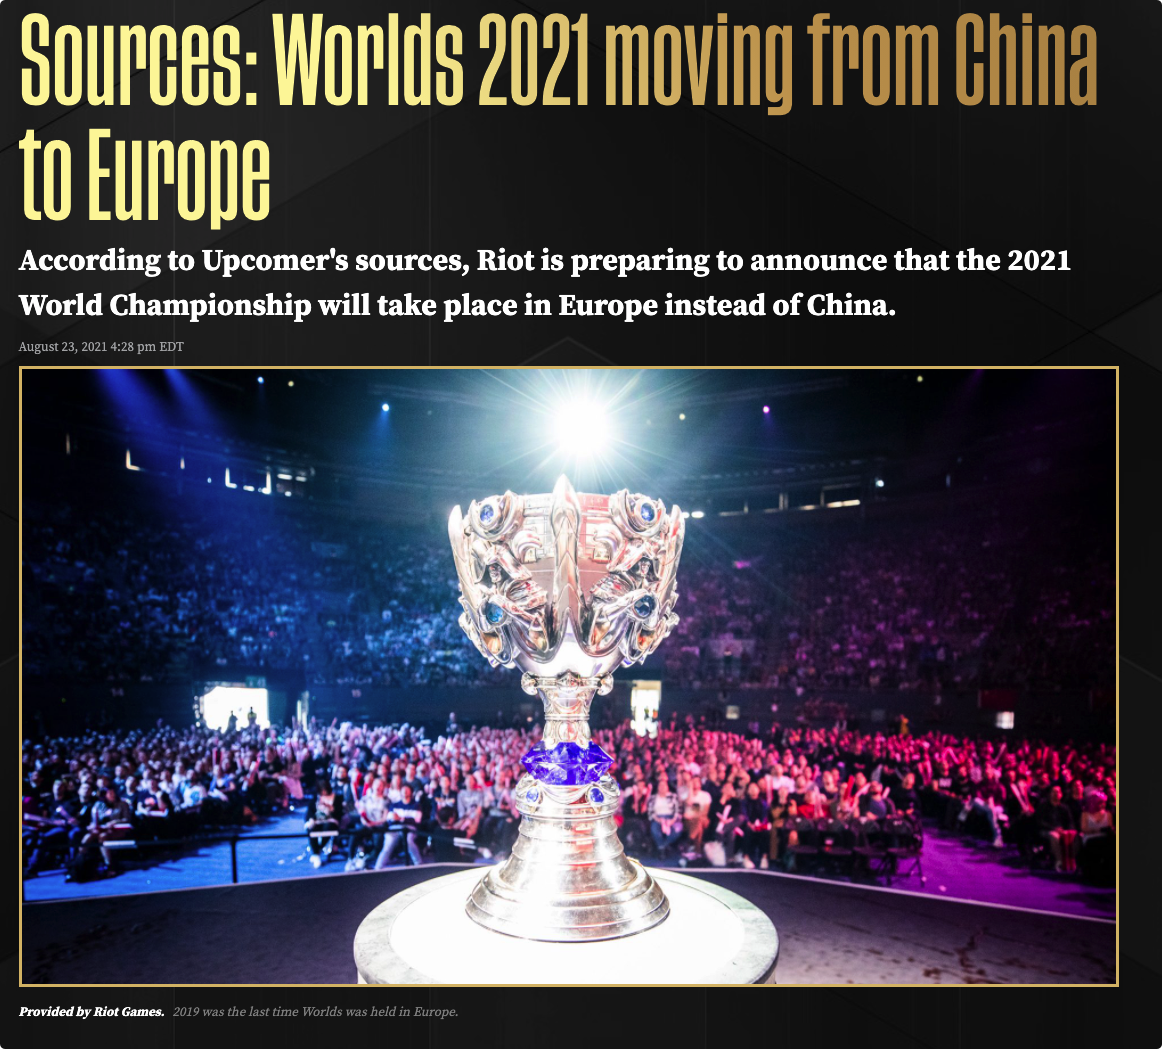 S11世界赛转移至欧洲举办!原因分析及优缺点梳理,好坏各一半吧